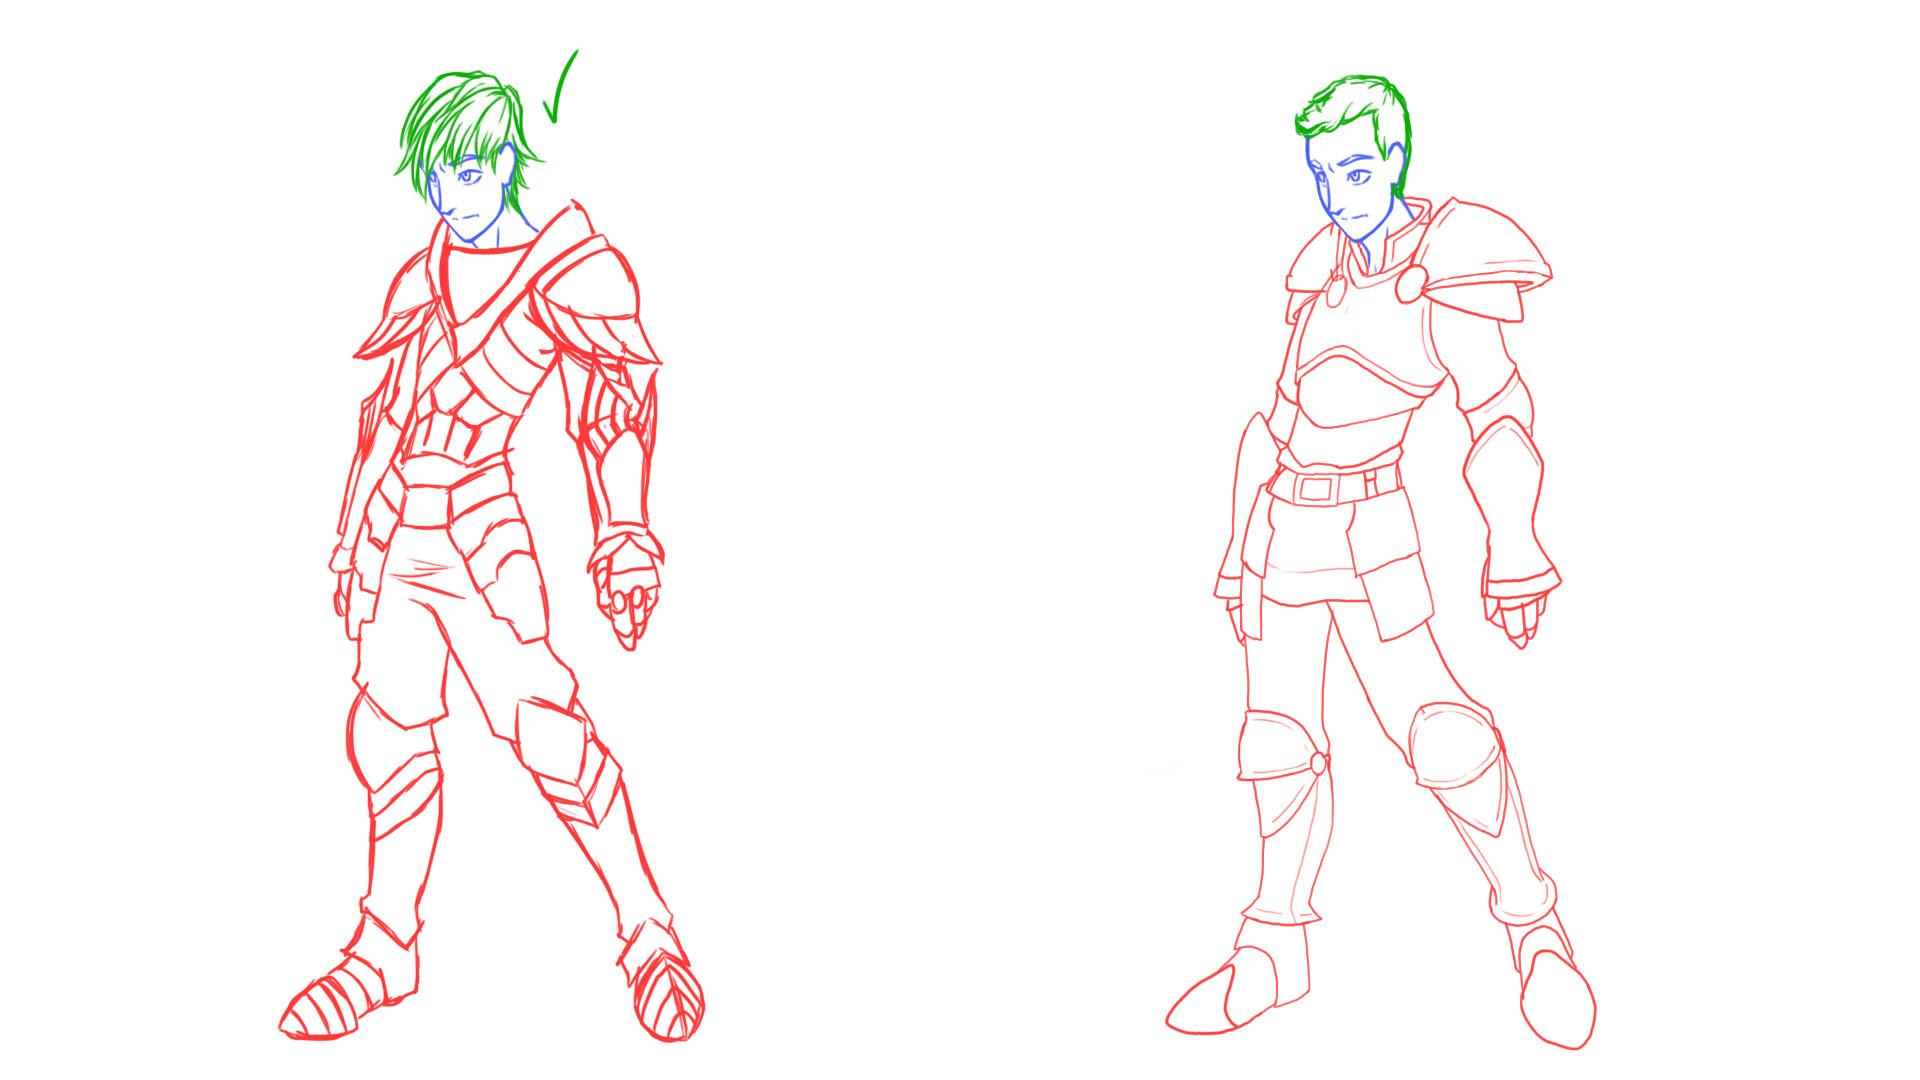 Nick: Armor Concept 2